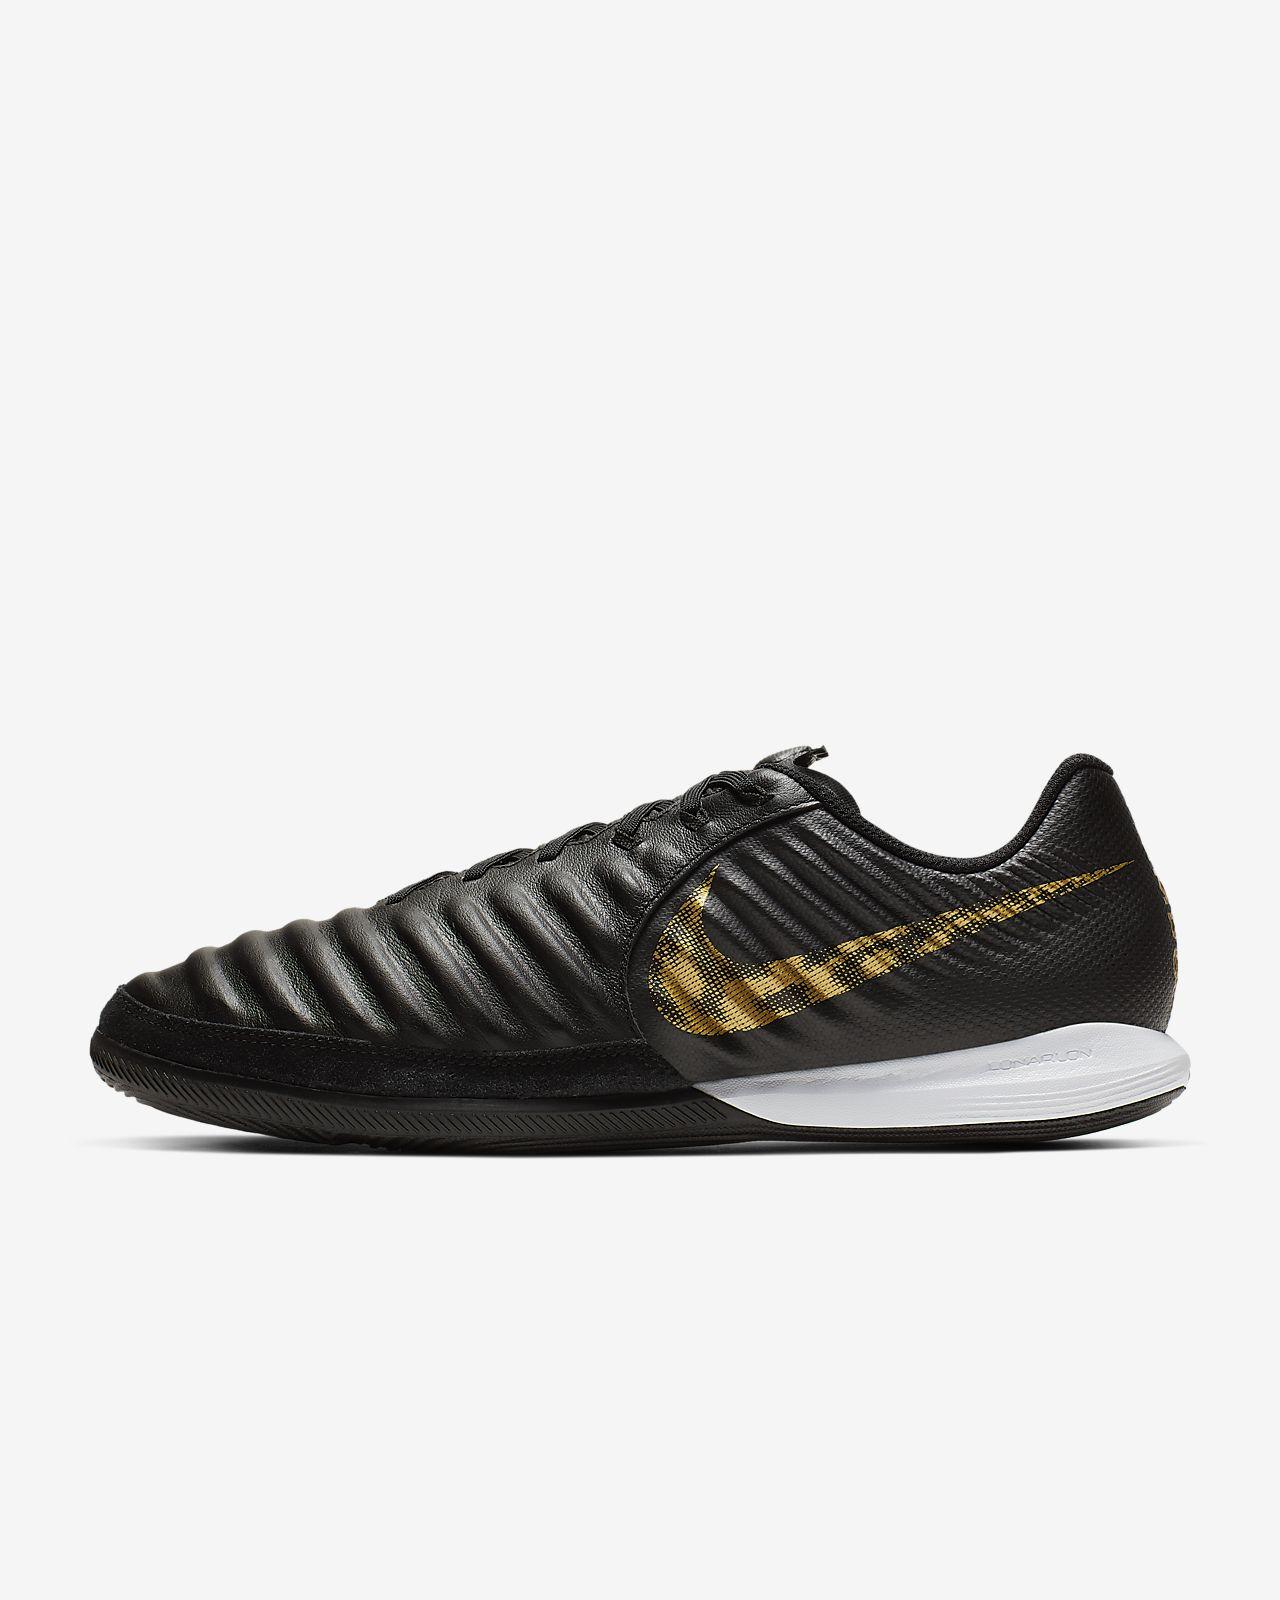 Chaussure de football en salle Nike TiempoX Lunar Legend VII Pro